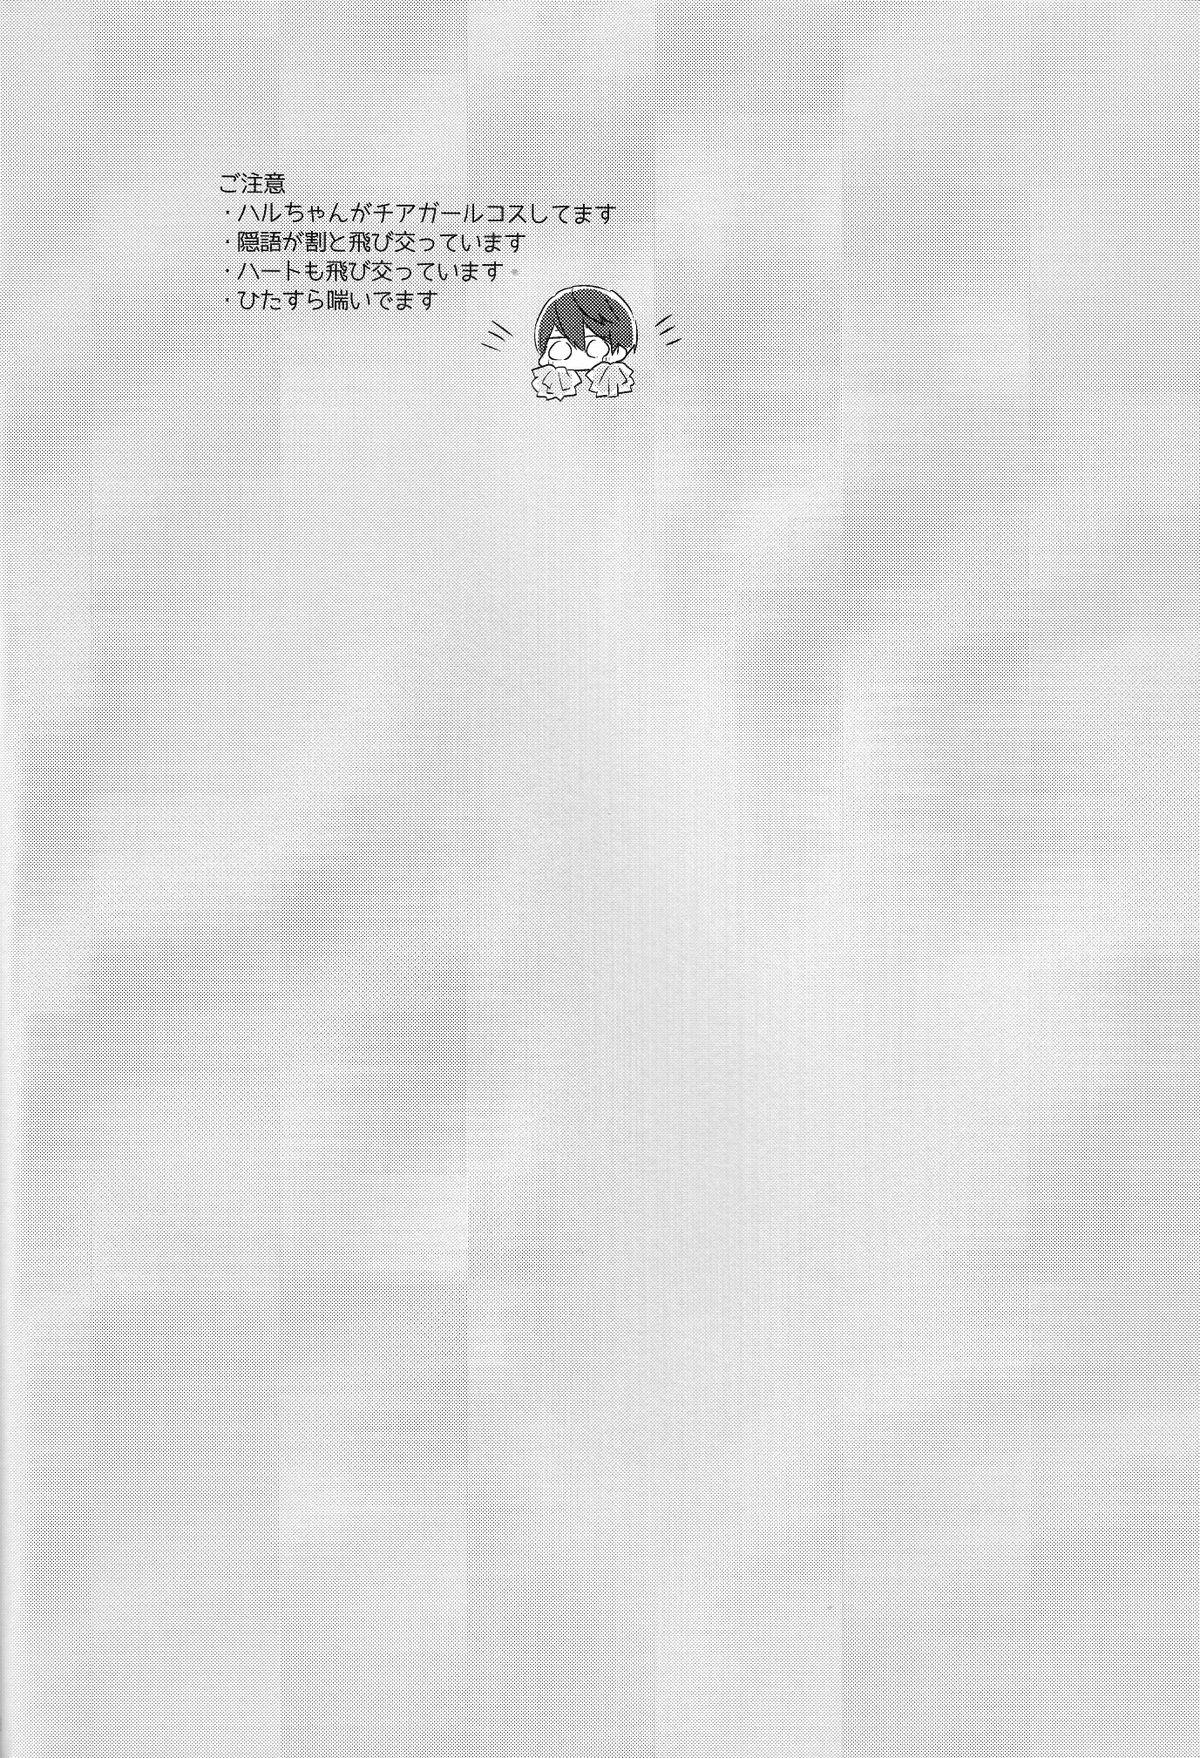 (Renai Endorphin 2) [Sneeeze (Kubu)] Cheer Haru-chan no Yuutsu | The Melancholy of Cheerleader Haru-chan (Free!) [English] {Anneioux} 2